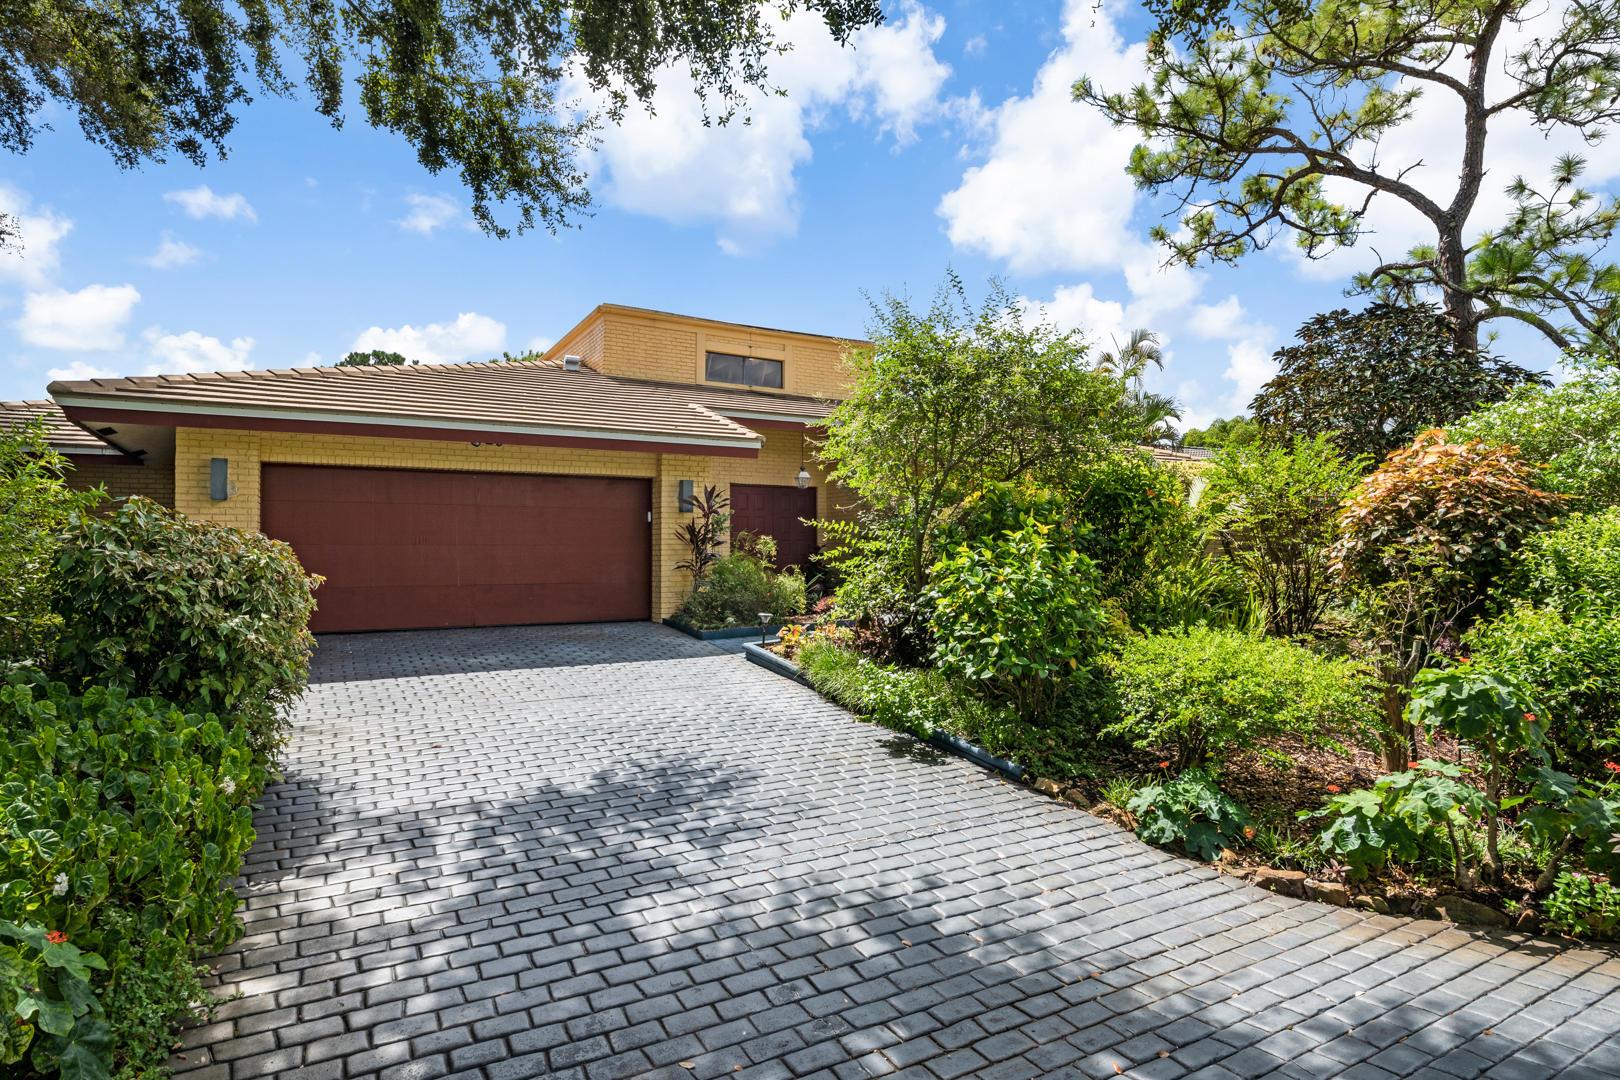 614 W Lakewoode West Circle - Delray Beach, Florida